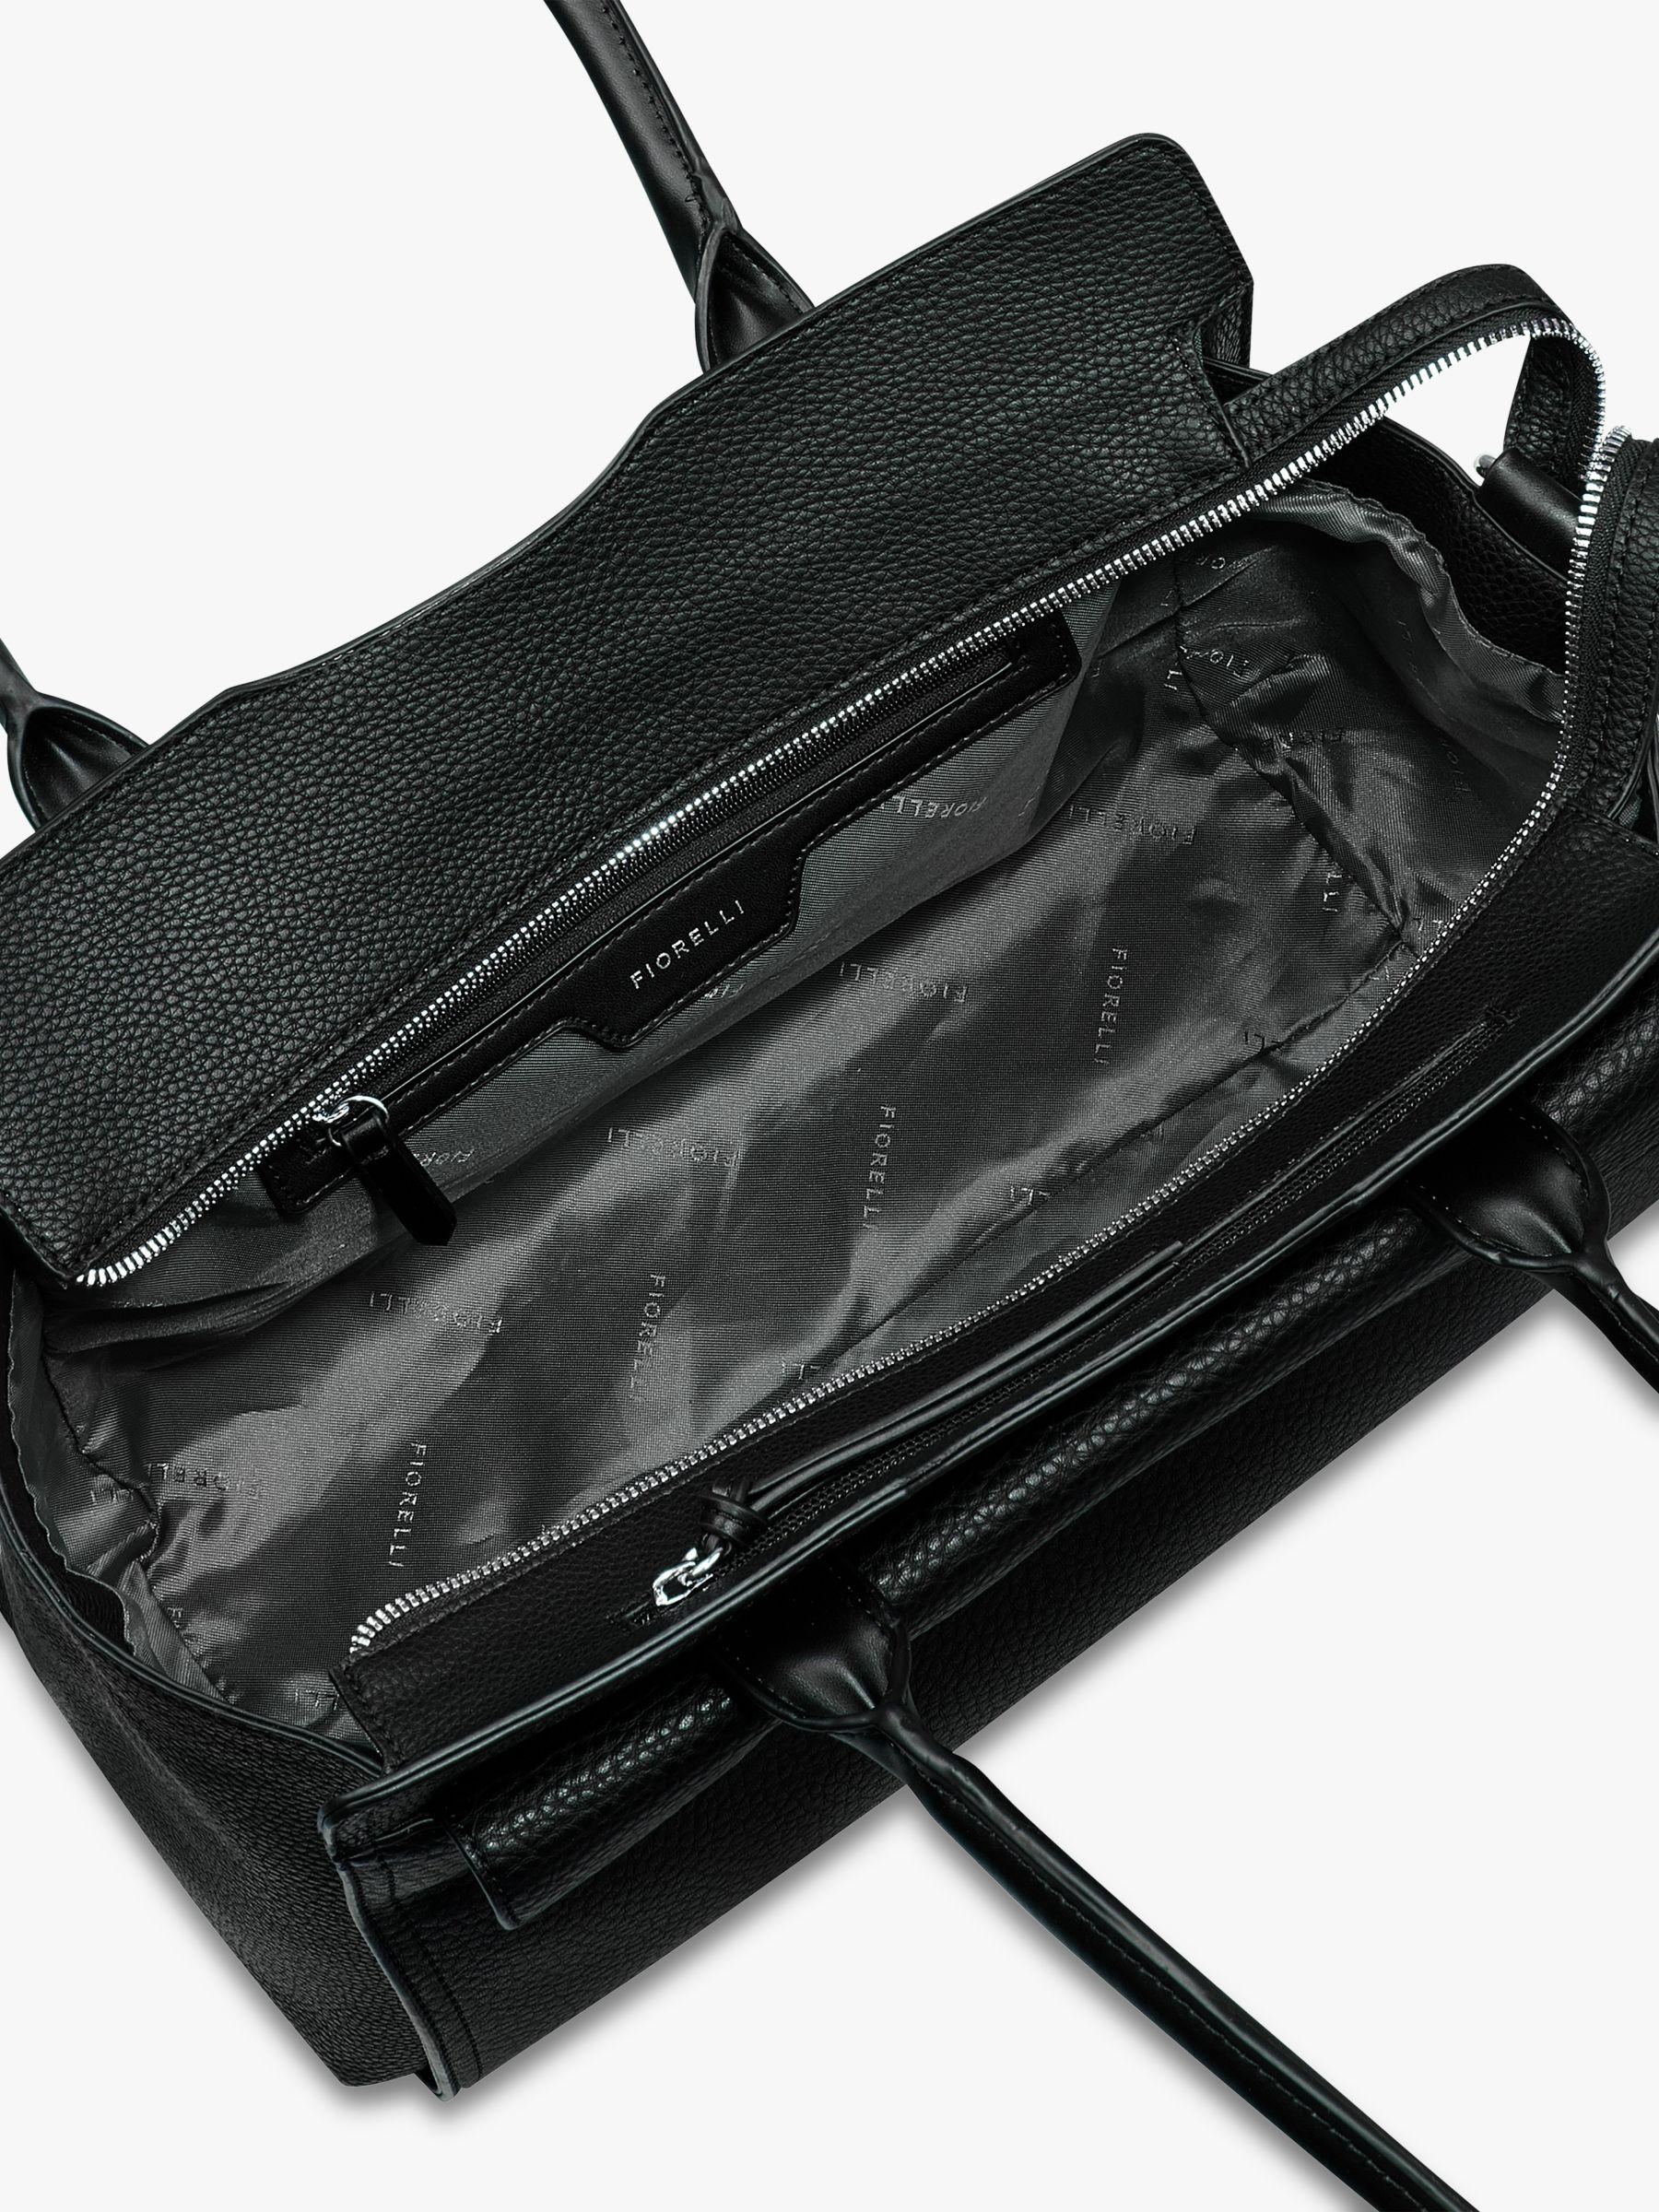 da1ead9cfaaf Fiorelli Mila Tote Bag in Black - Lyst